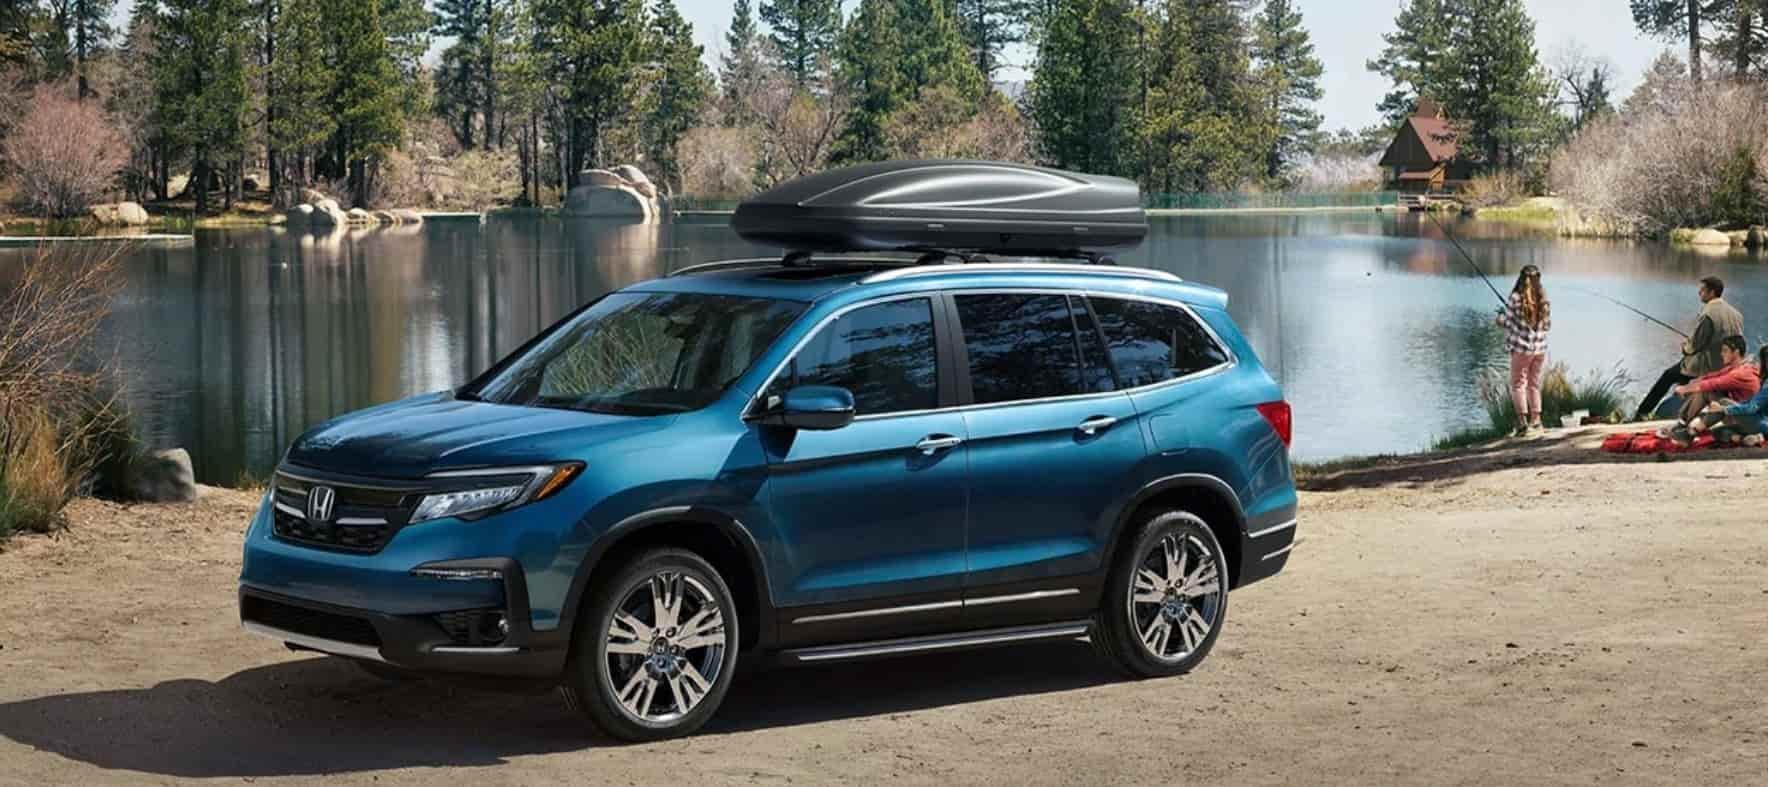 Honda Presidents Day Sale near Denver CO